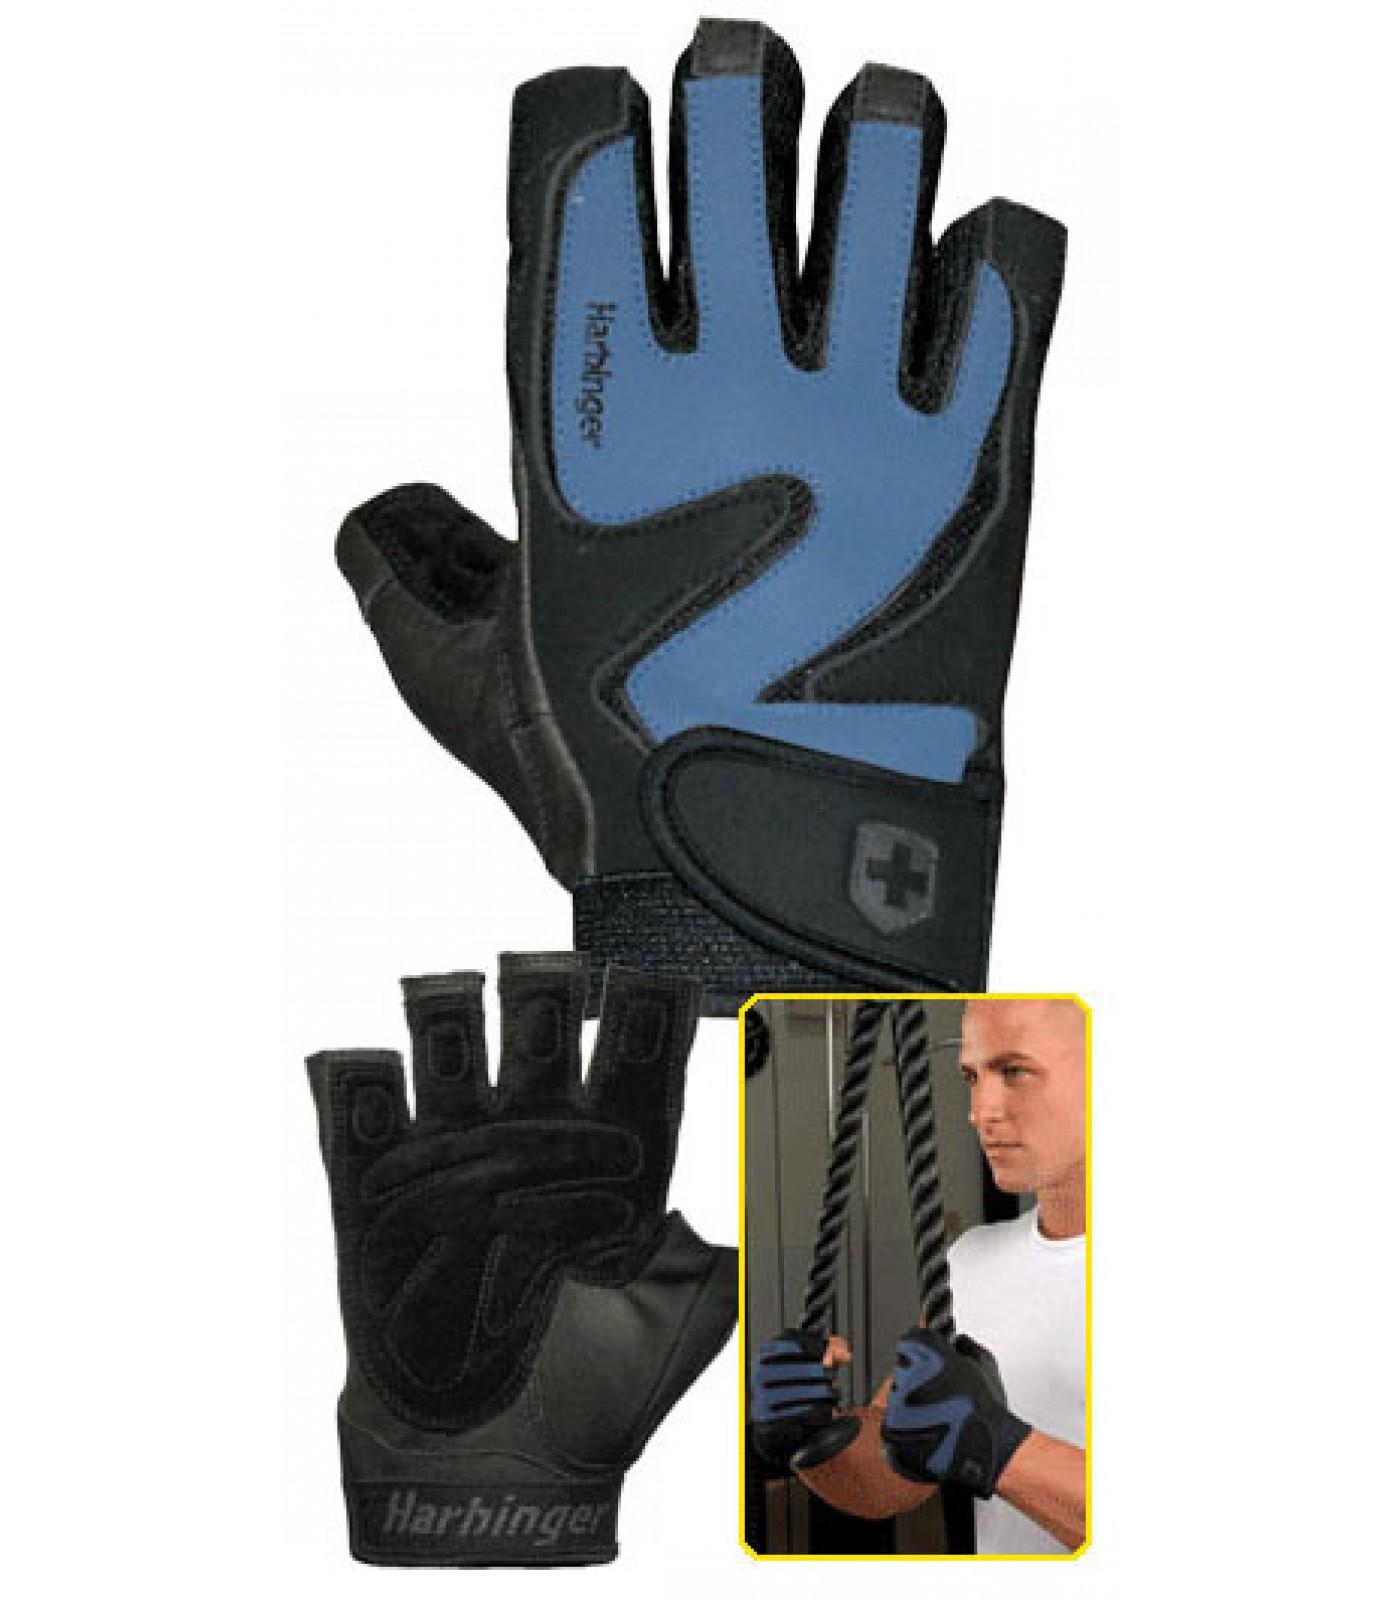 Harbinger - Training Grip - черно/син цвят